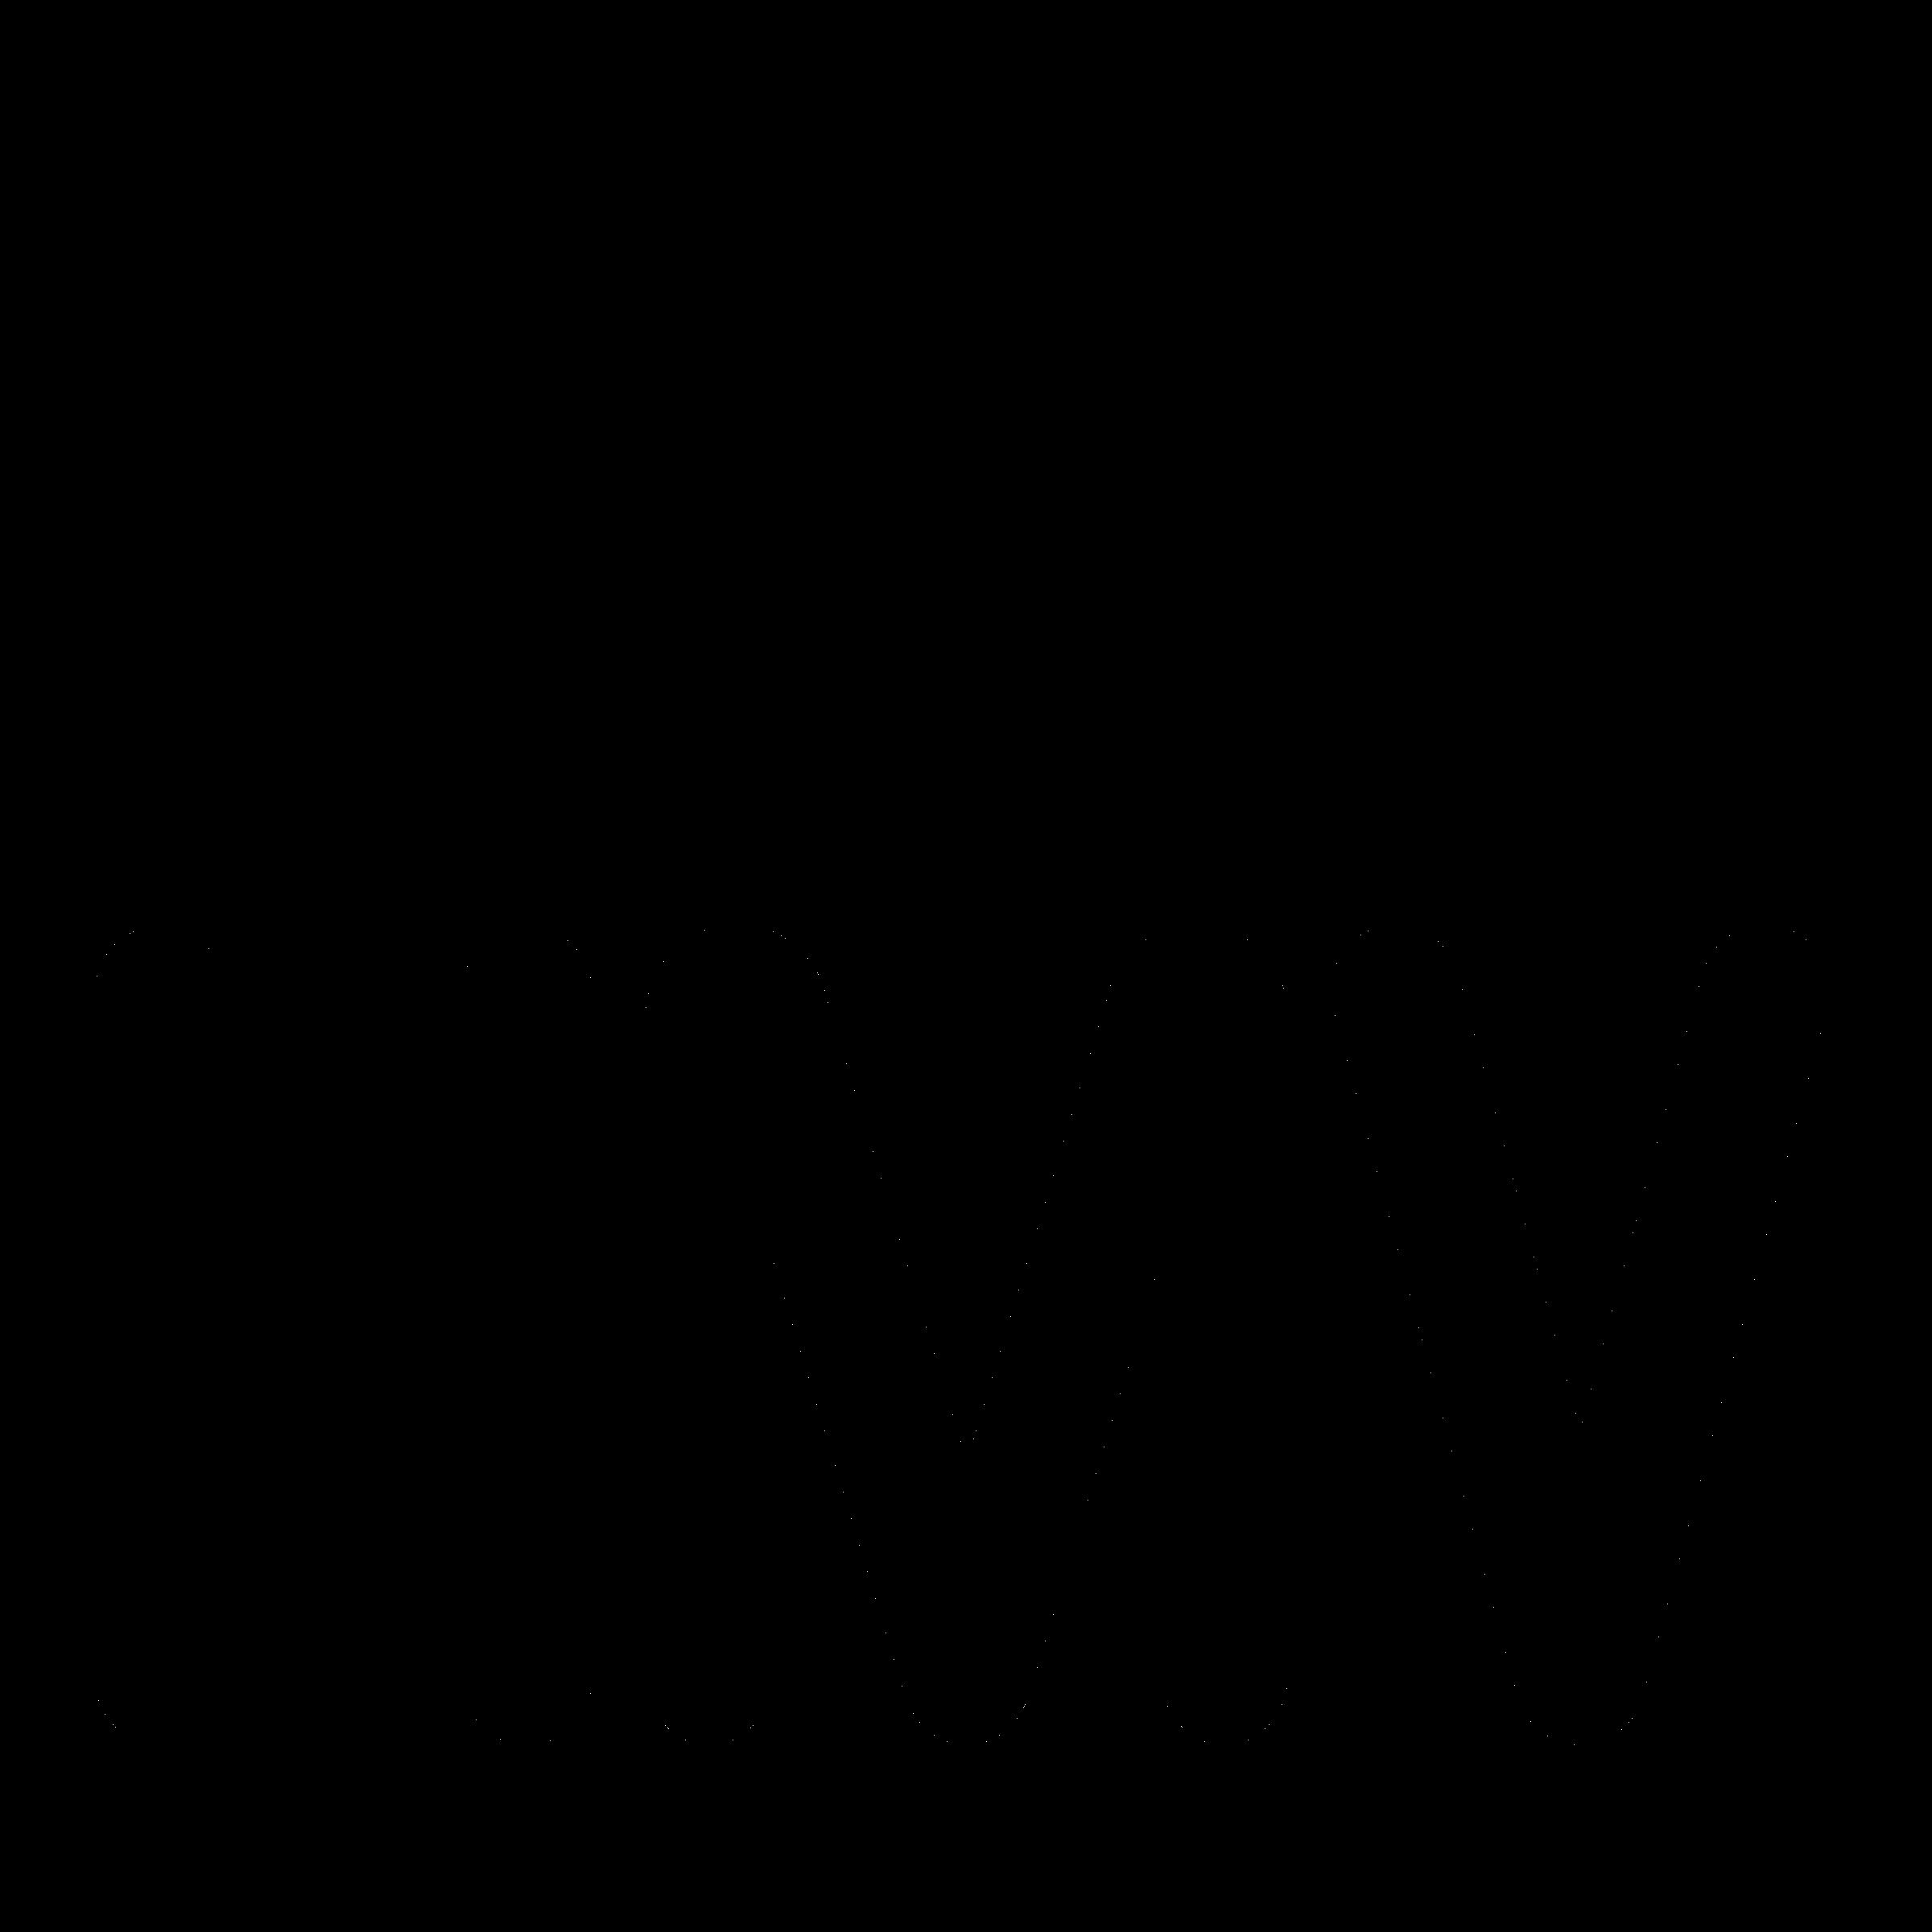 Hmv Logo Png Transparent Svg Vector Freebie Supply